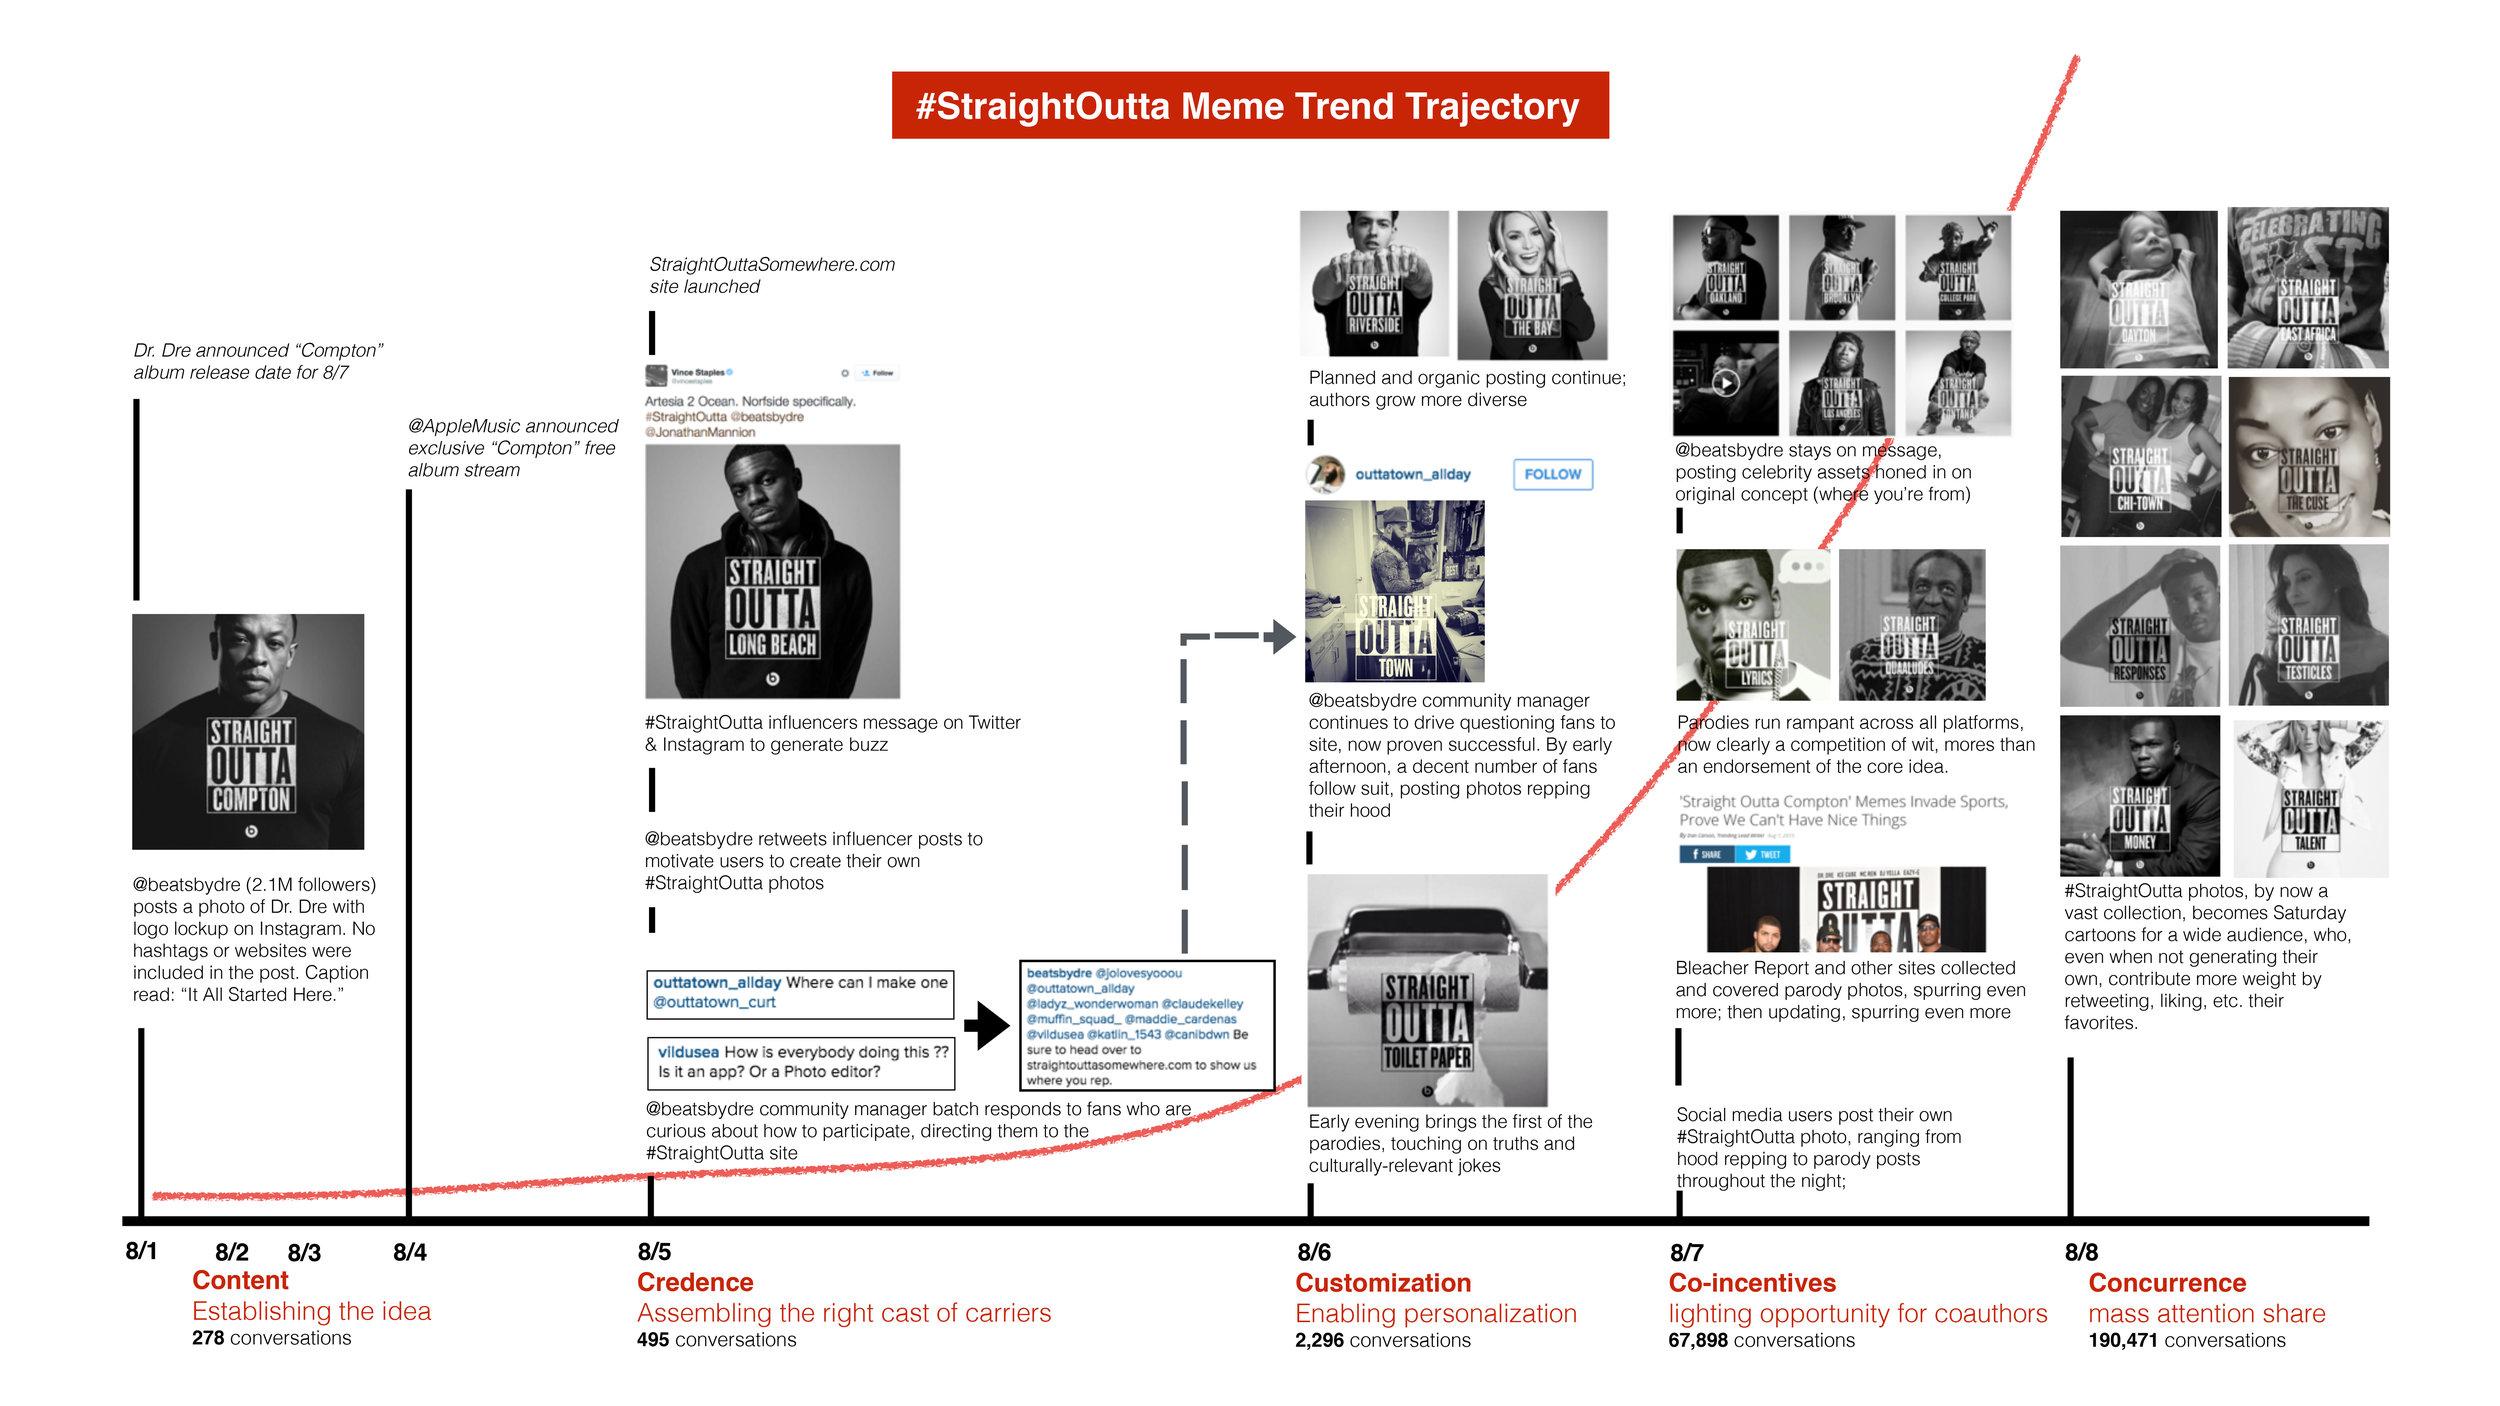 #StraightOutta Trend Trajectory.jpg